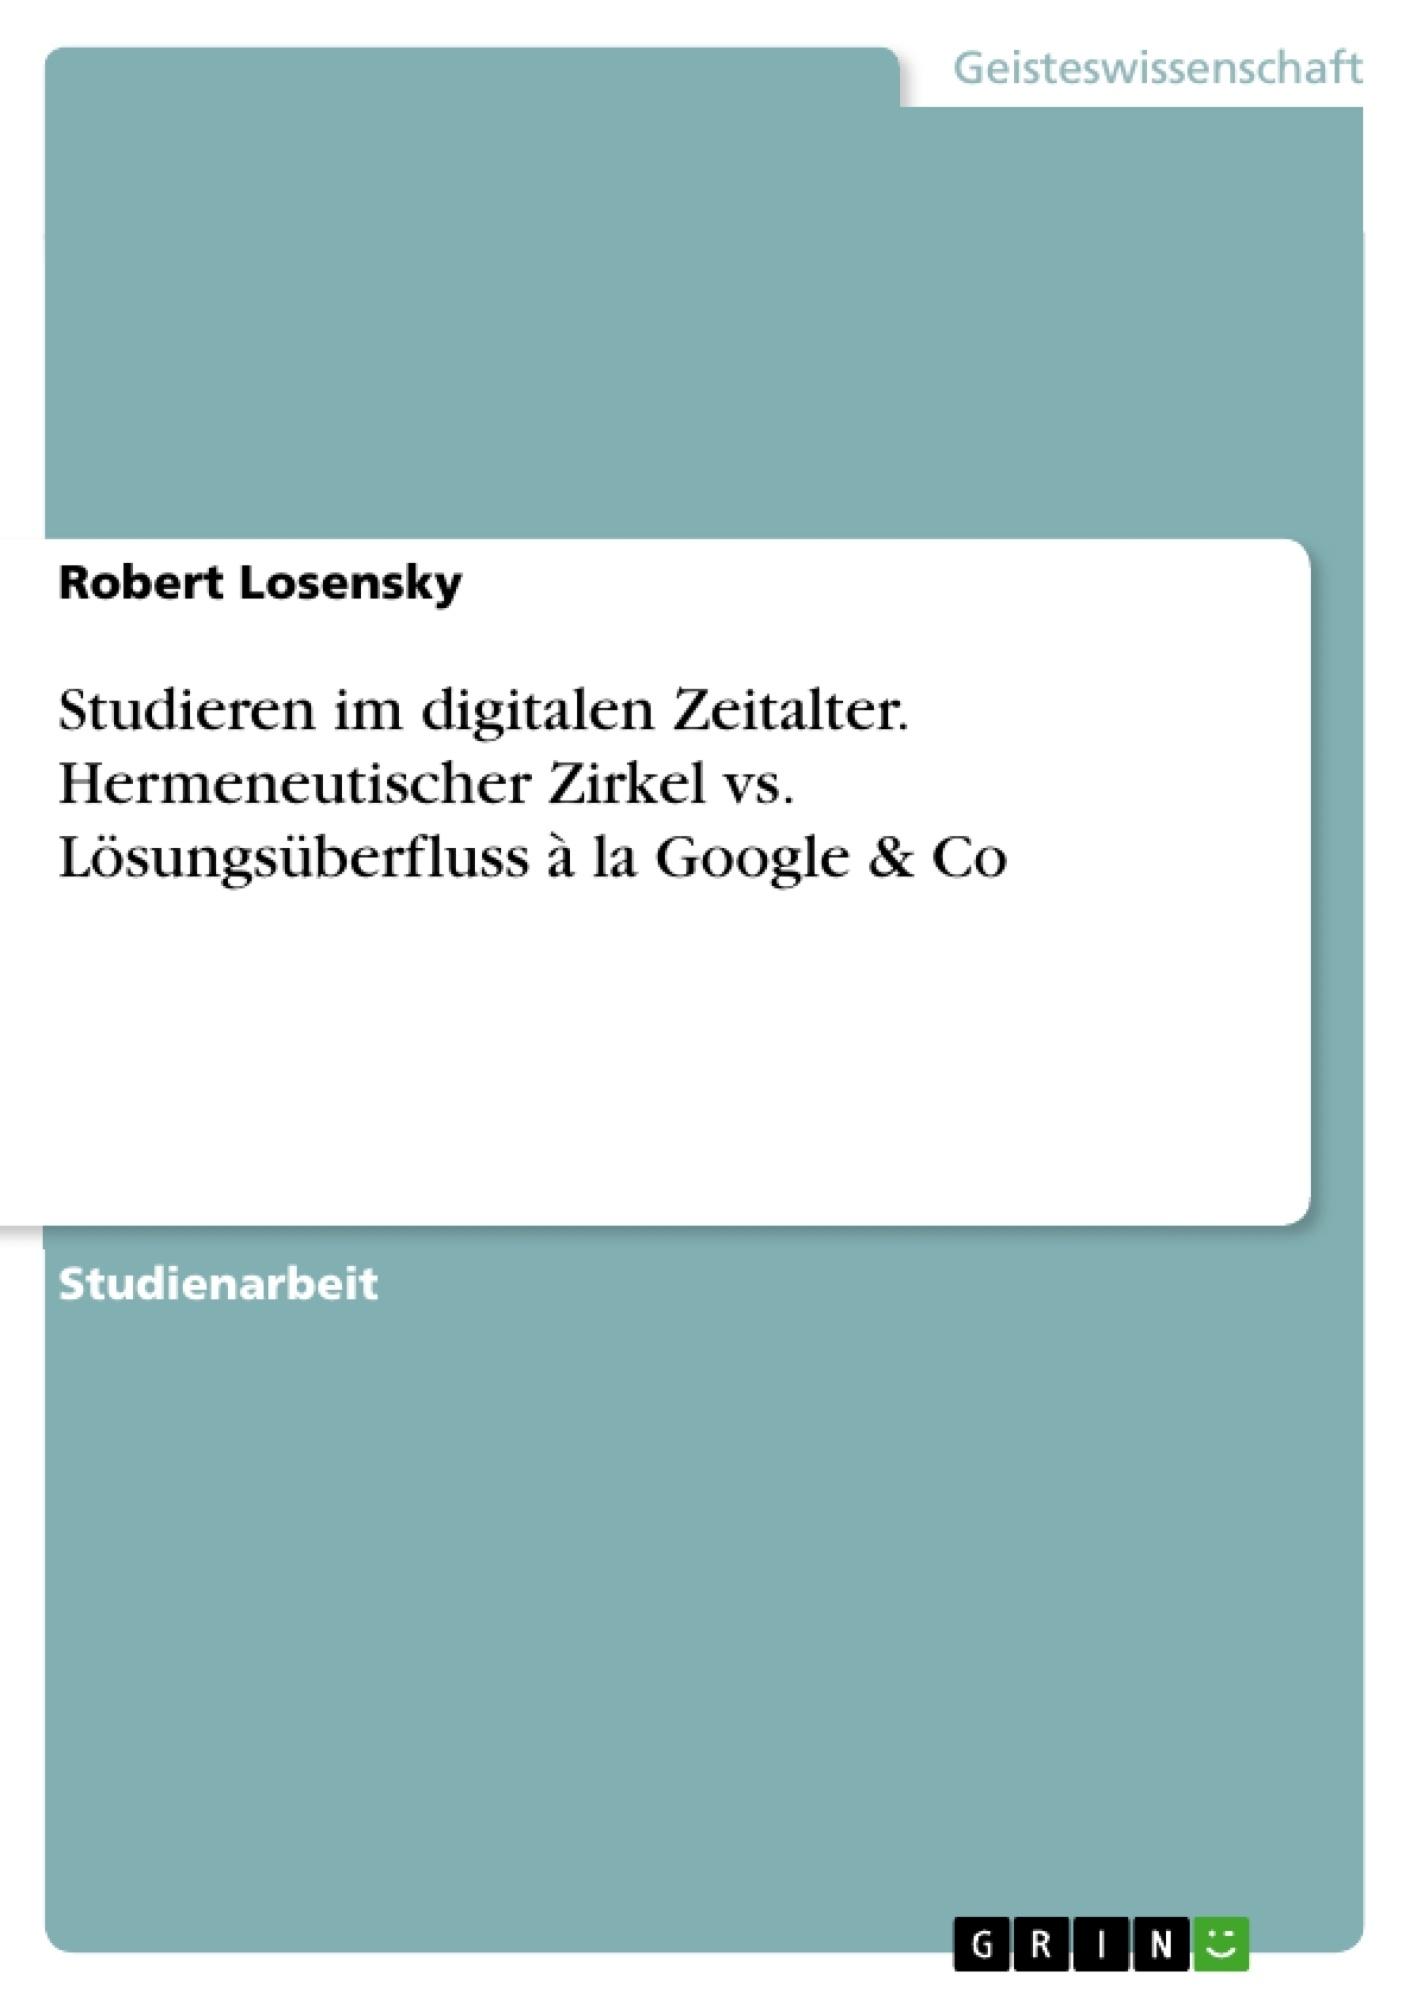 Titel: Studieren im digitalen Zeitalter. Hermeneutischer Zirkel vs. Lösungsüberfluss à la Google & Co